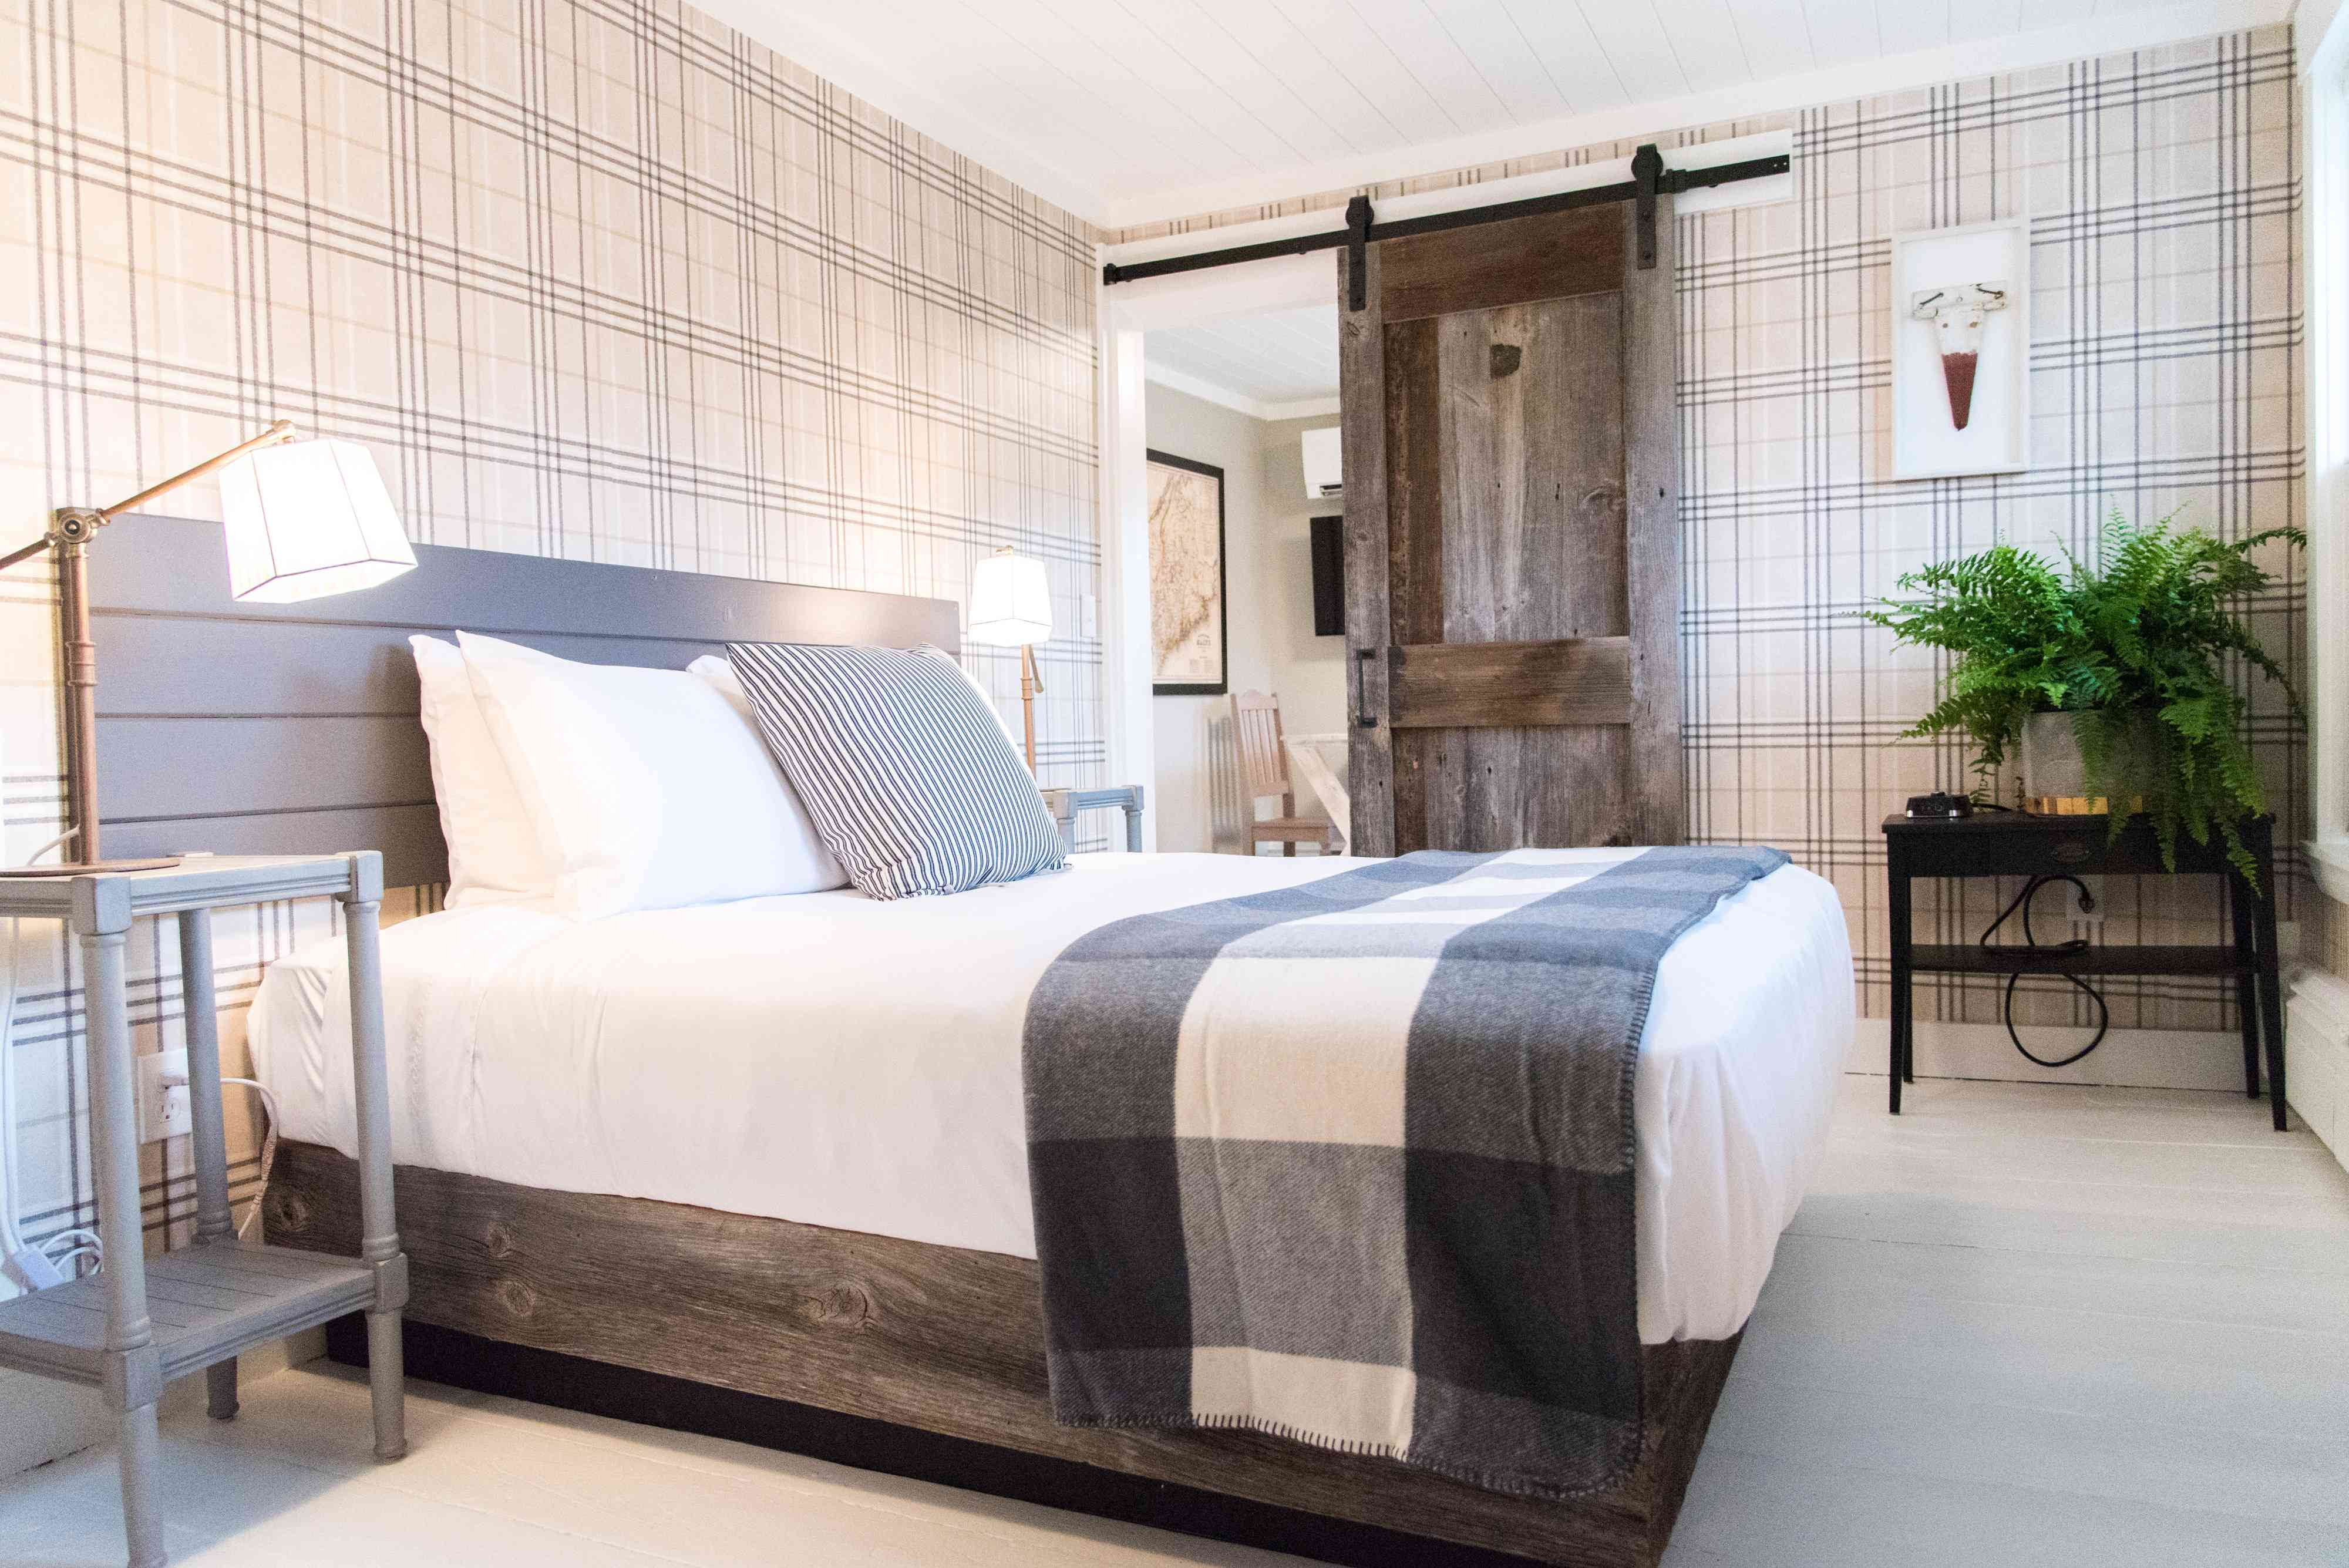 Hotel room with barnyard door and plaid wallpaper